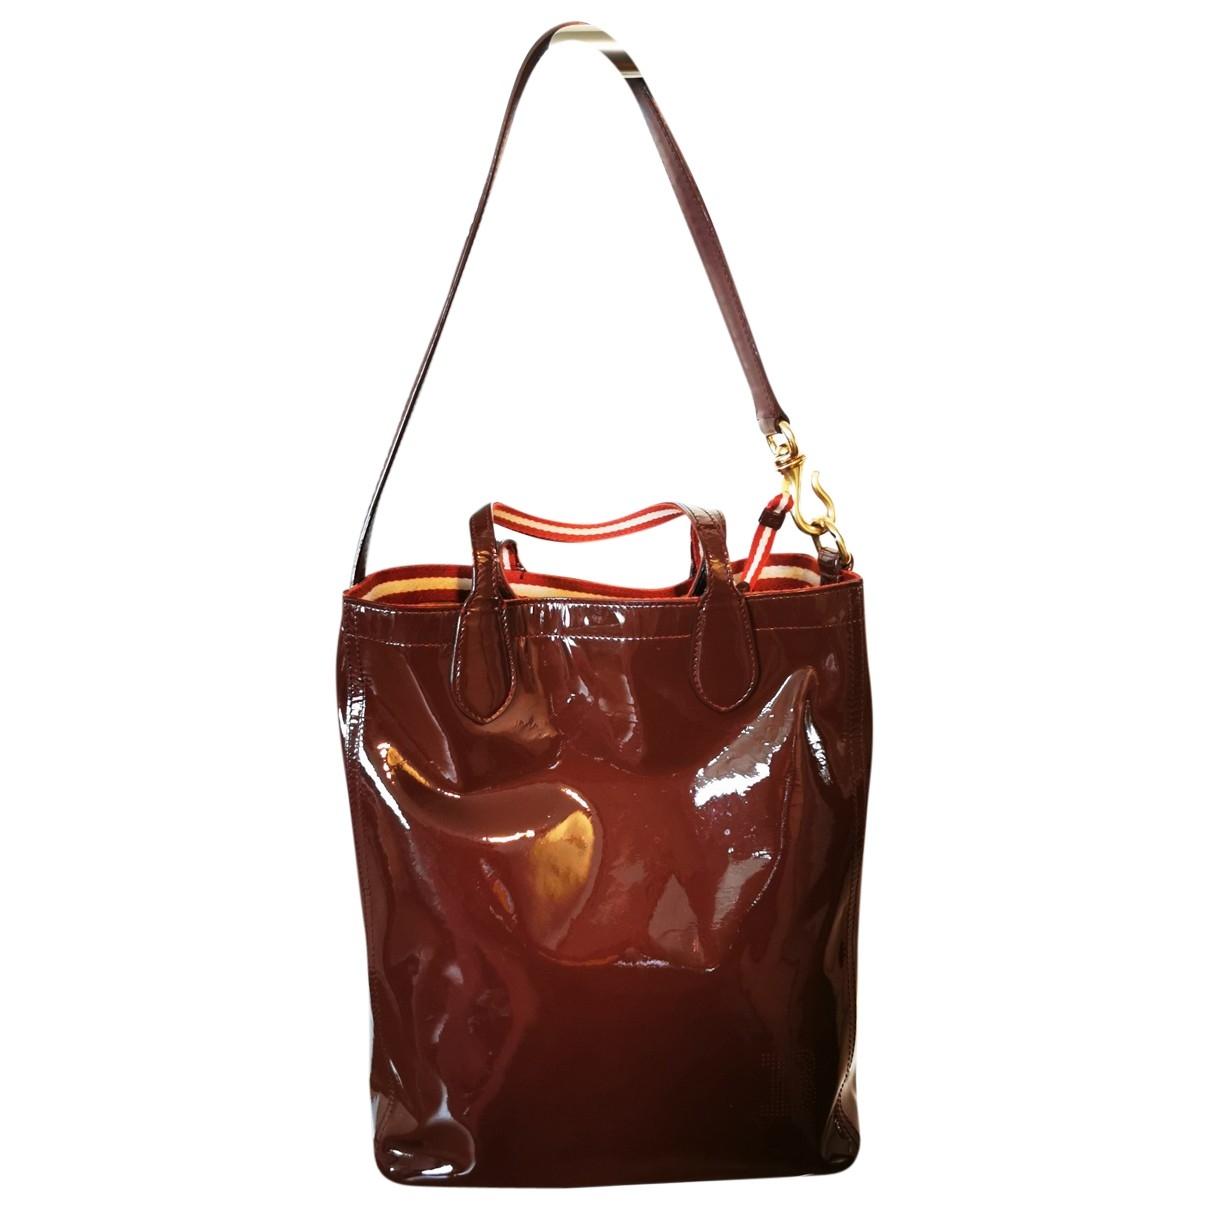 Bally \N Handtasche in  Bordeauxrot Lackleder